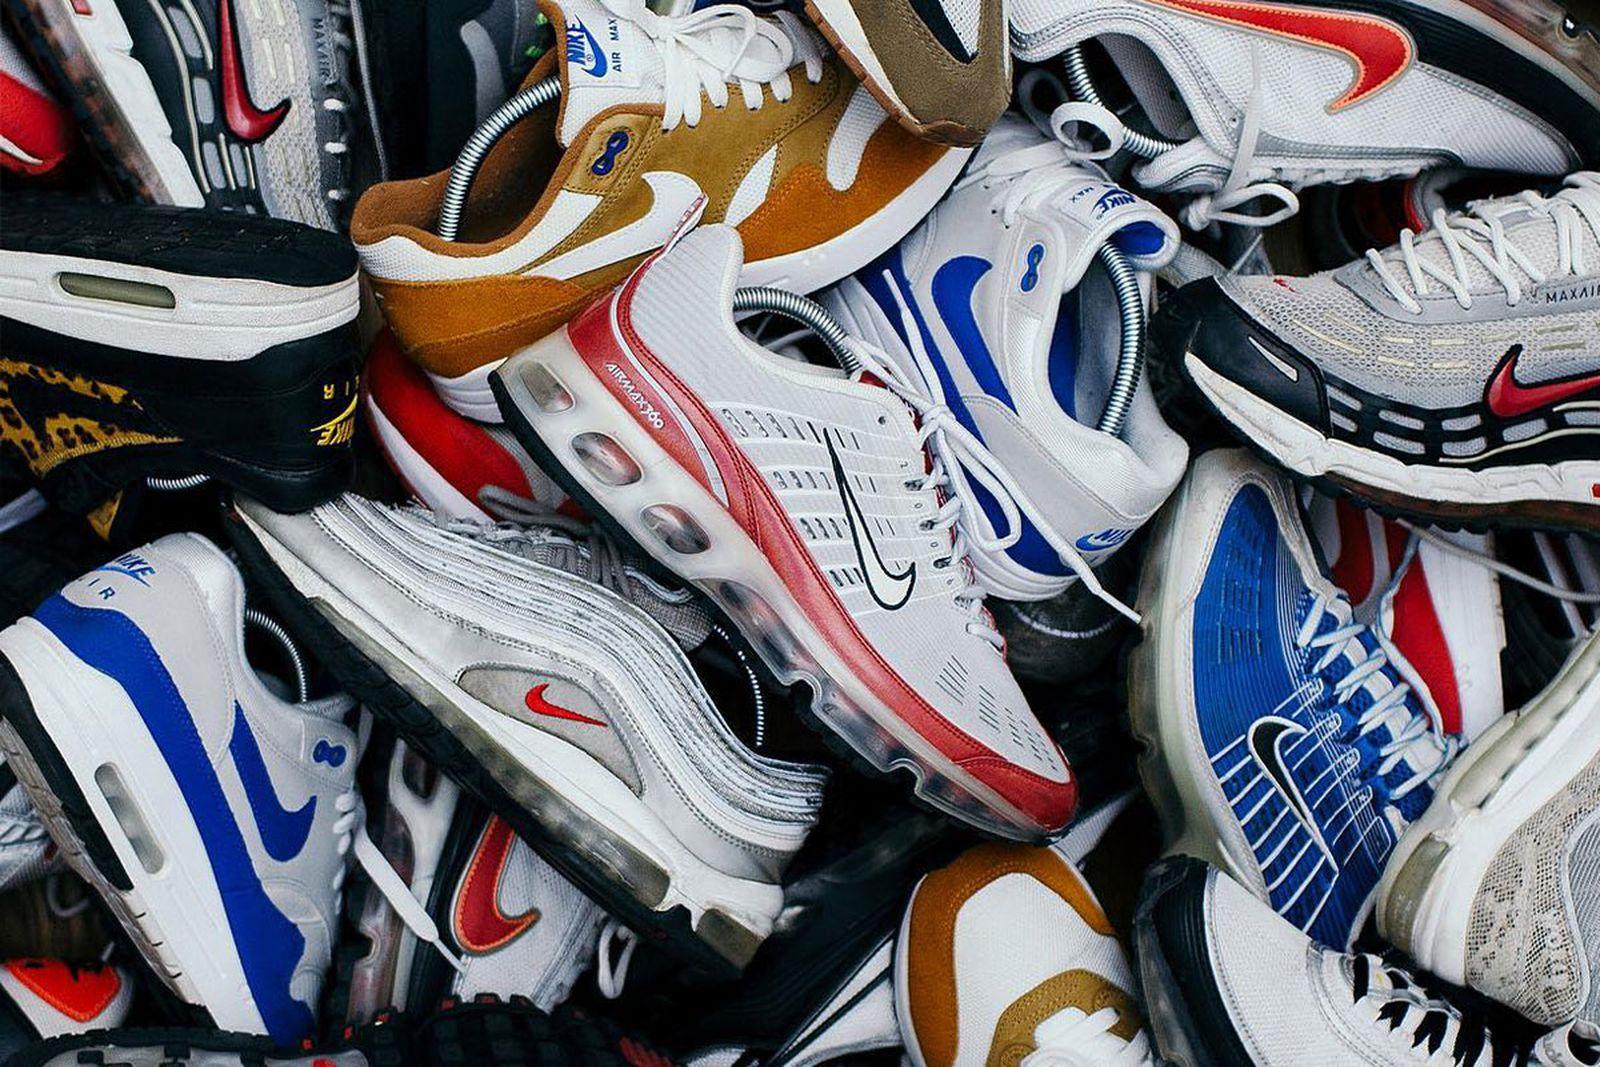 nike air max best ig sneakers Nike Air Max2 Light Pharrell Williams x adidas Originals adidas Crazy BYW LVL X